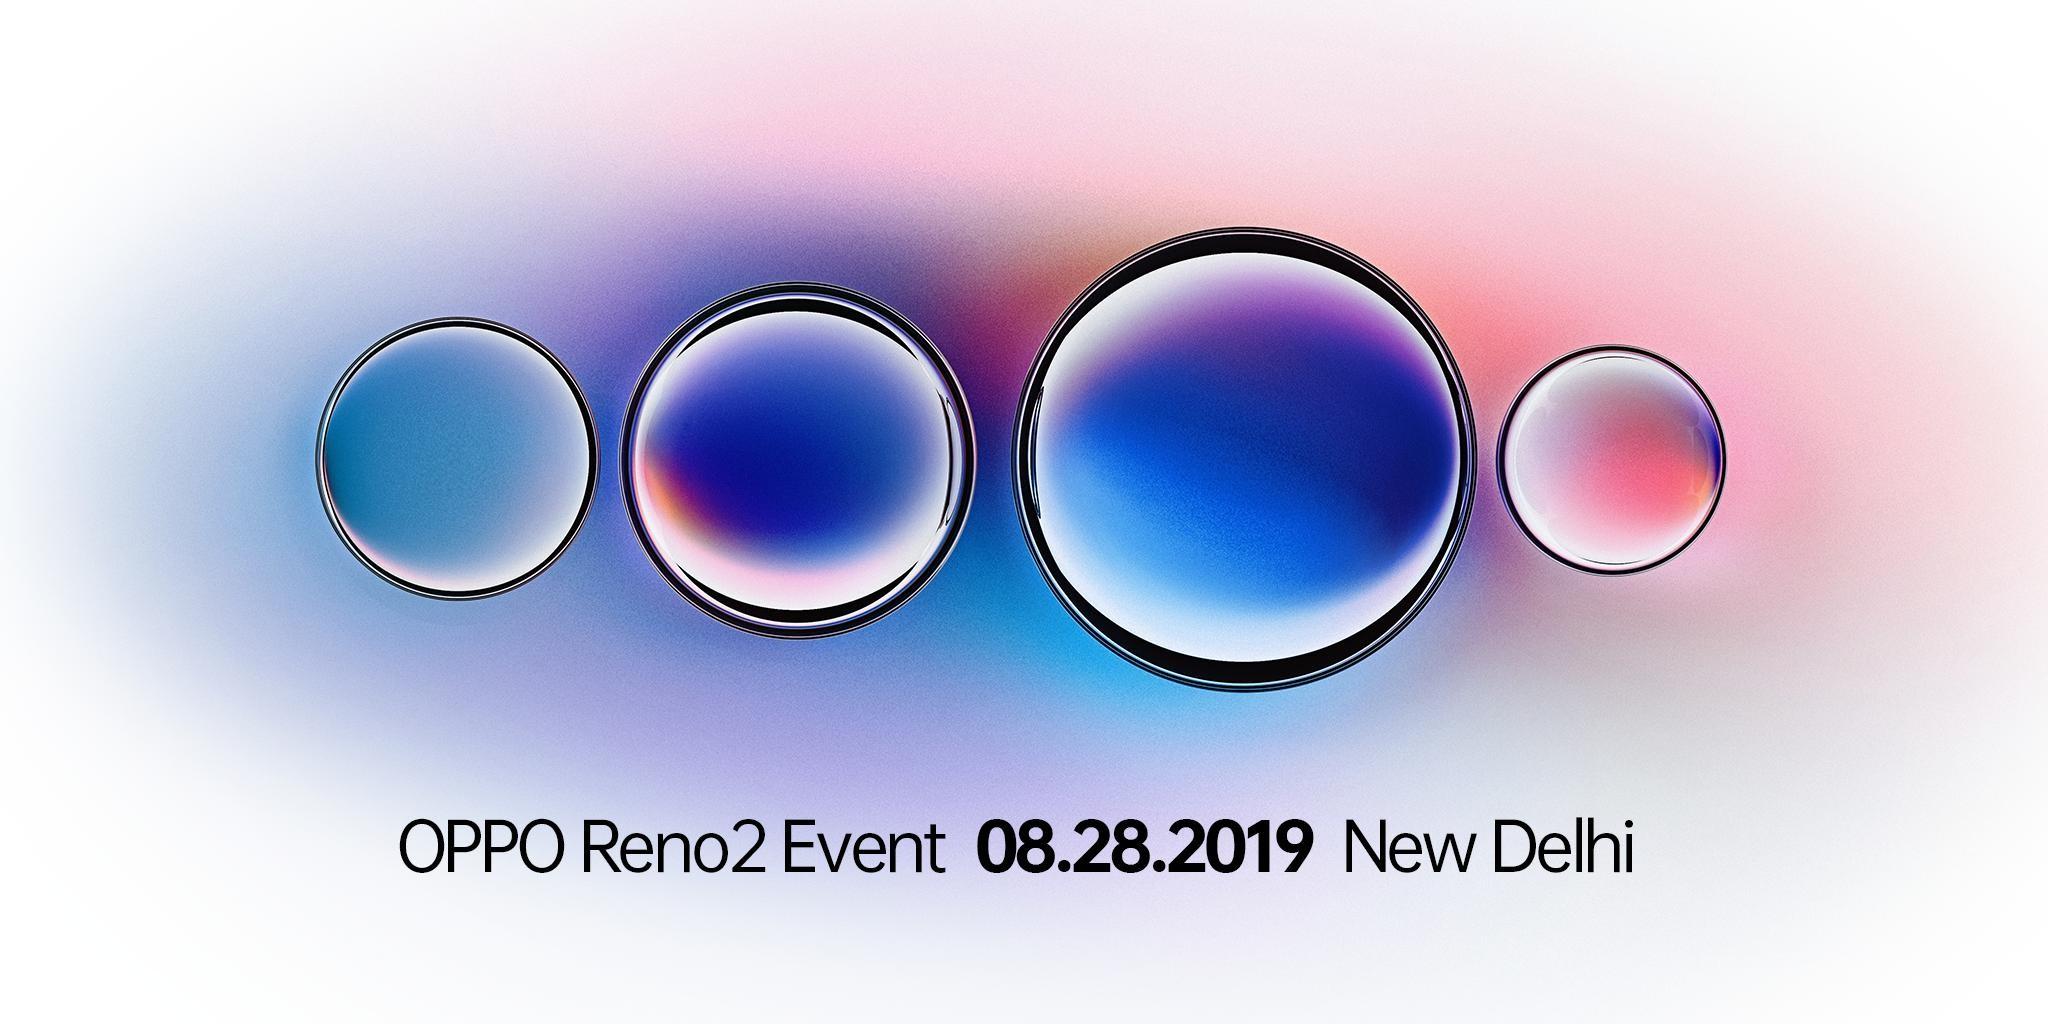 Oppo Reno 2 20x Zoom